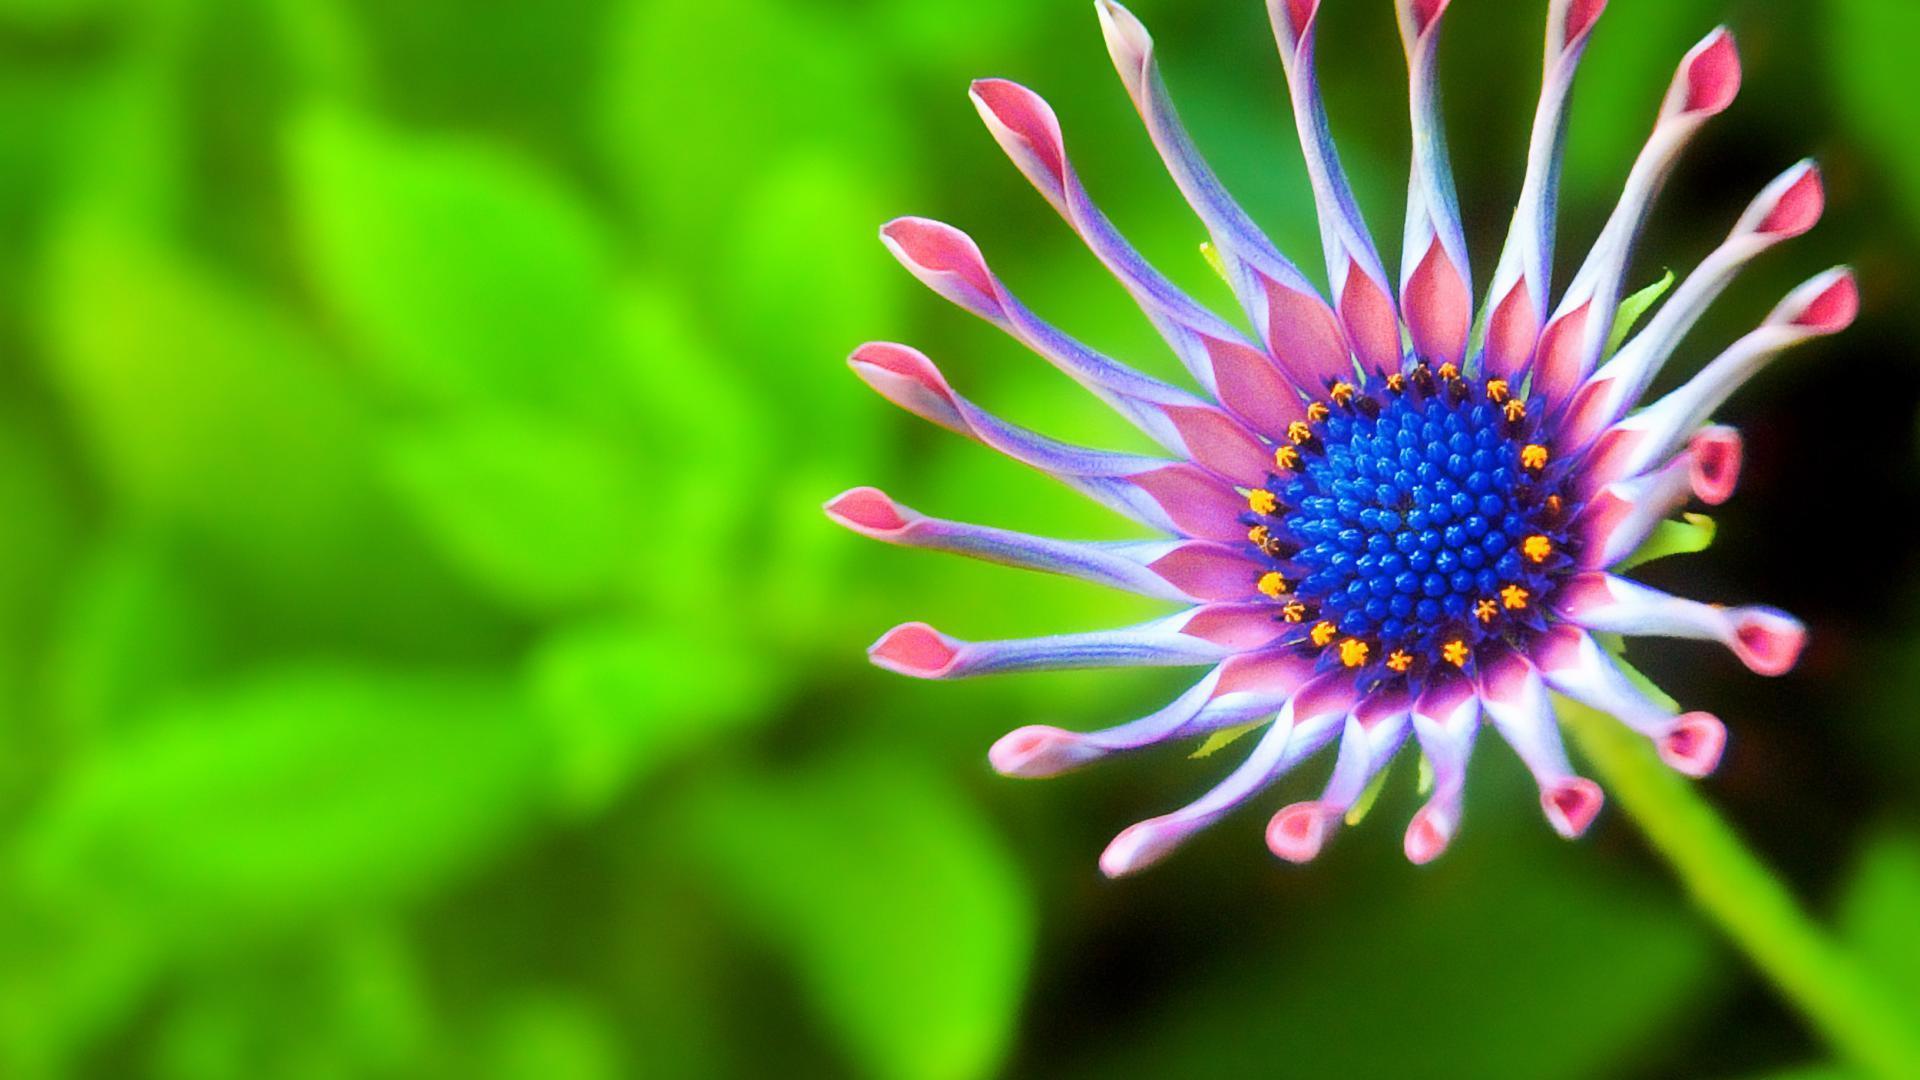 Free Download Flower Desktop Wallpapers Hd Download